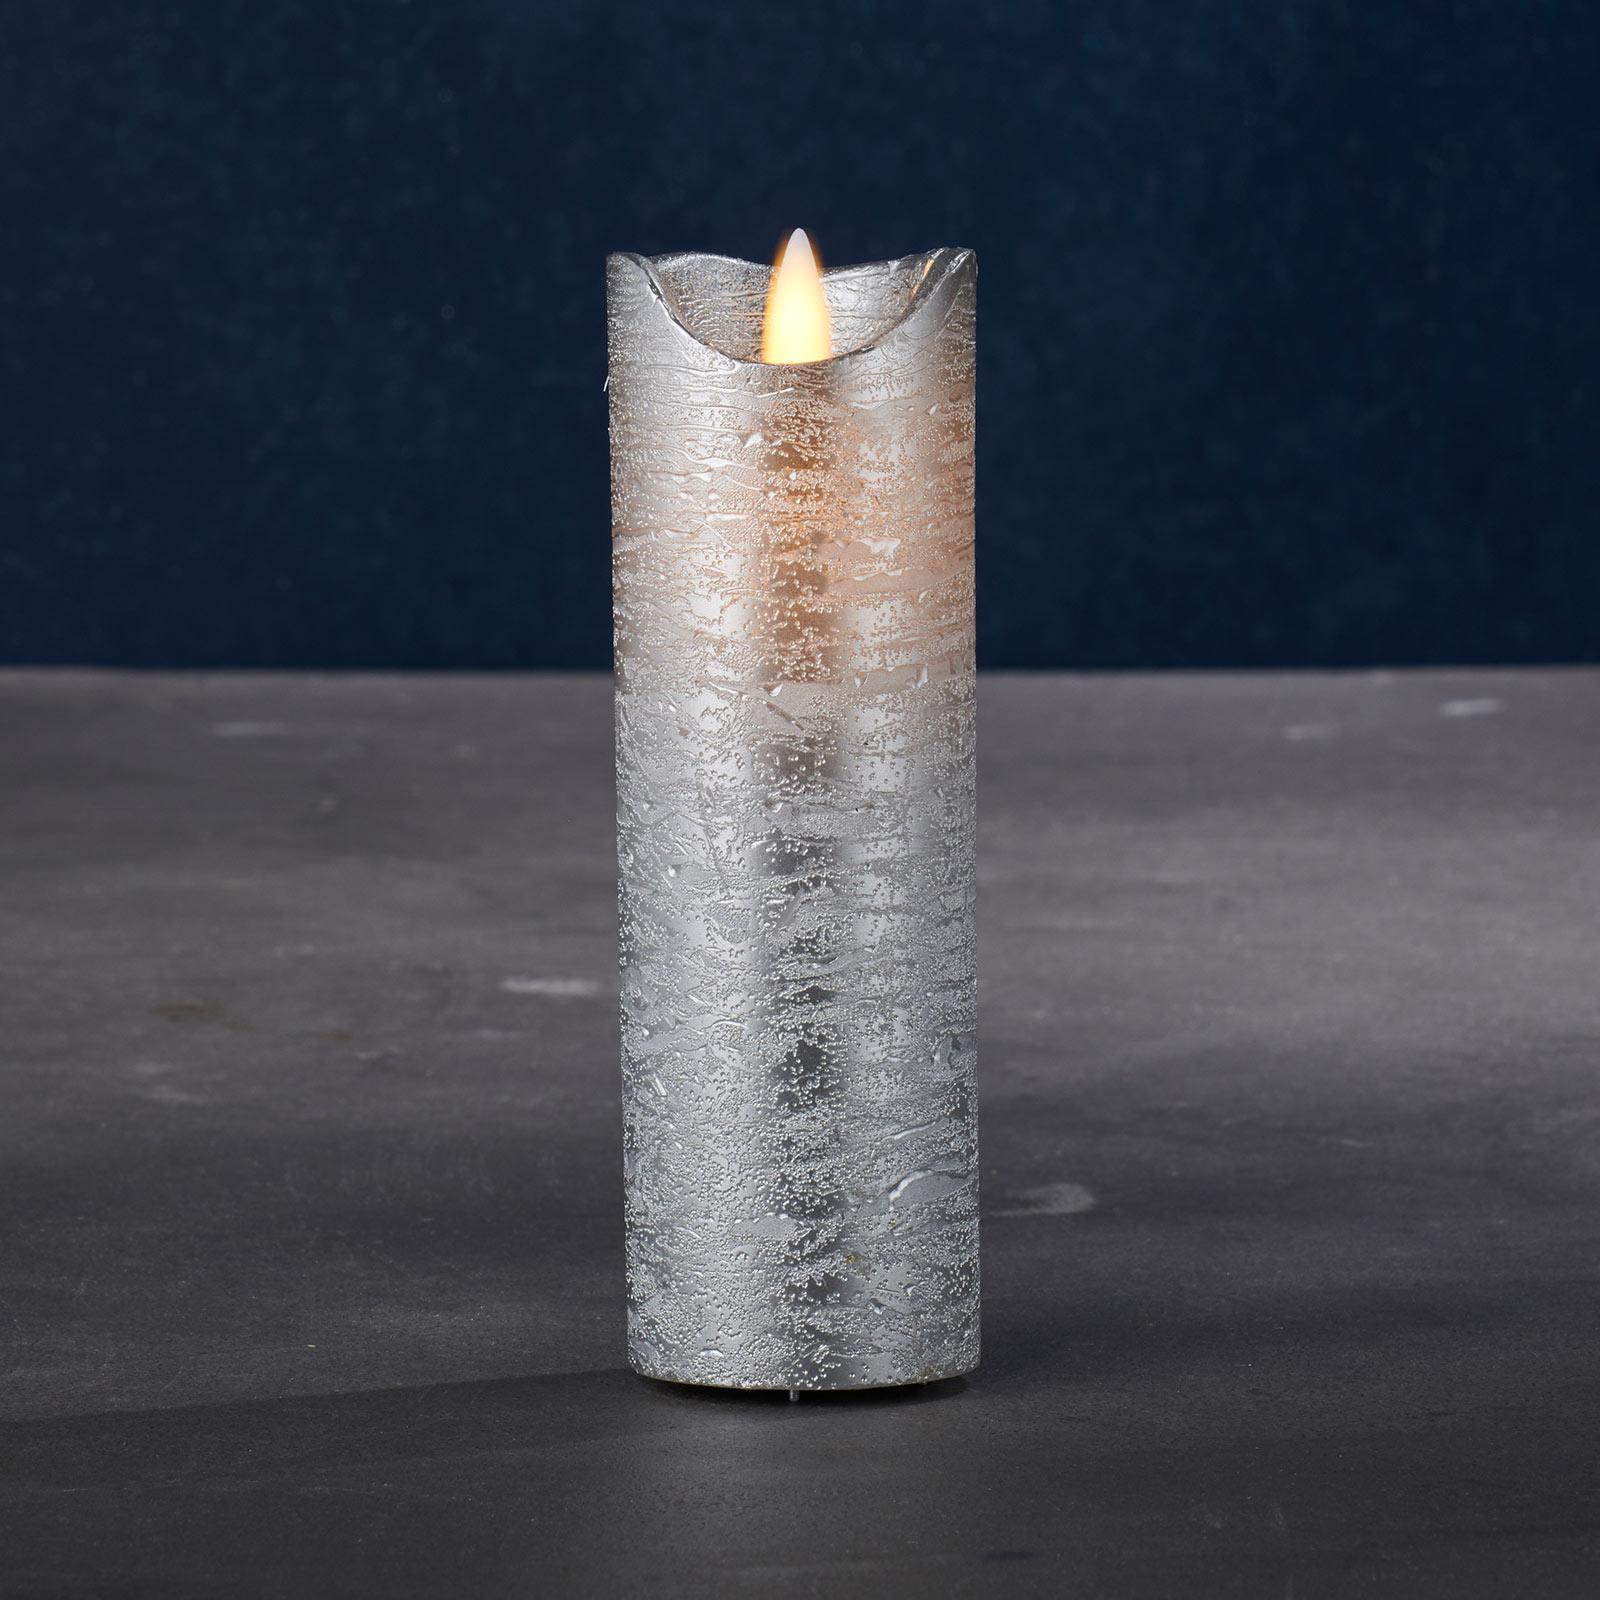 LED-Kerze Sara Exclusive, silber, Ø 5cm, Höhe 15cm